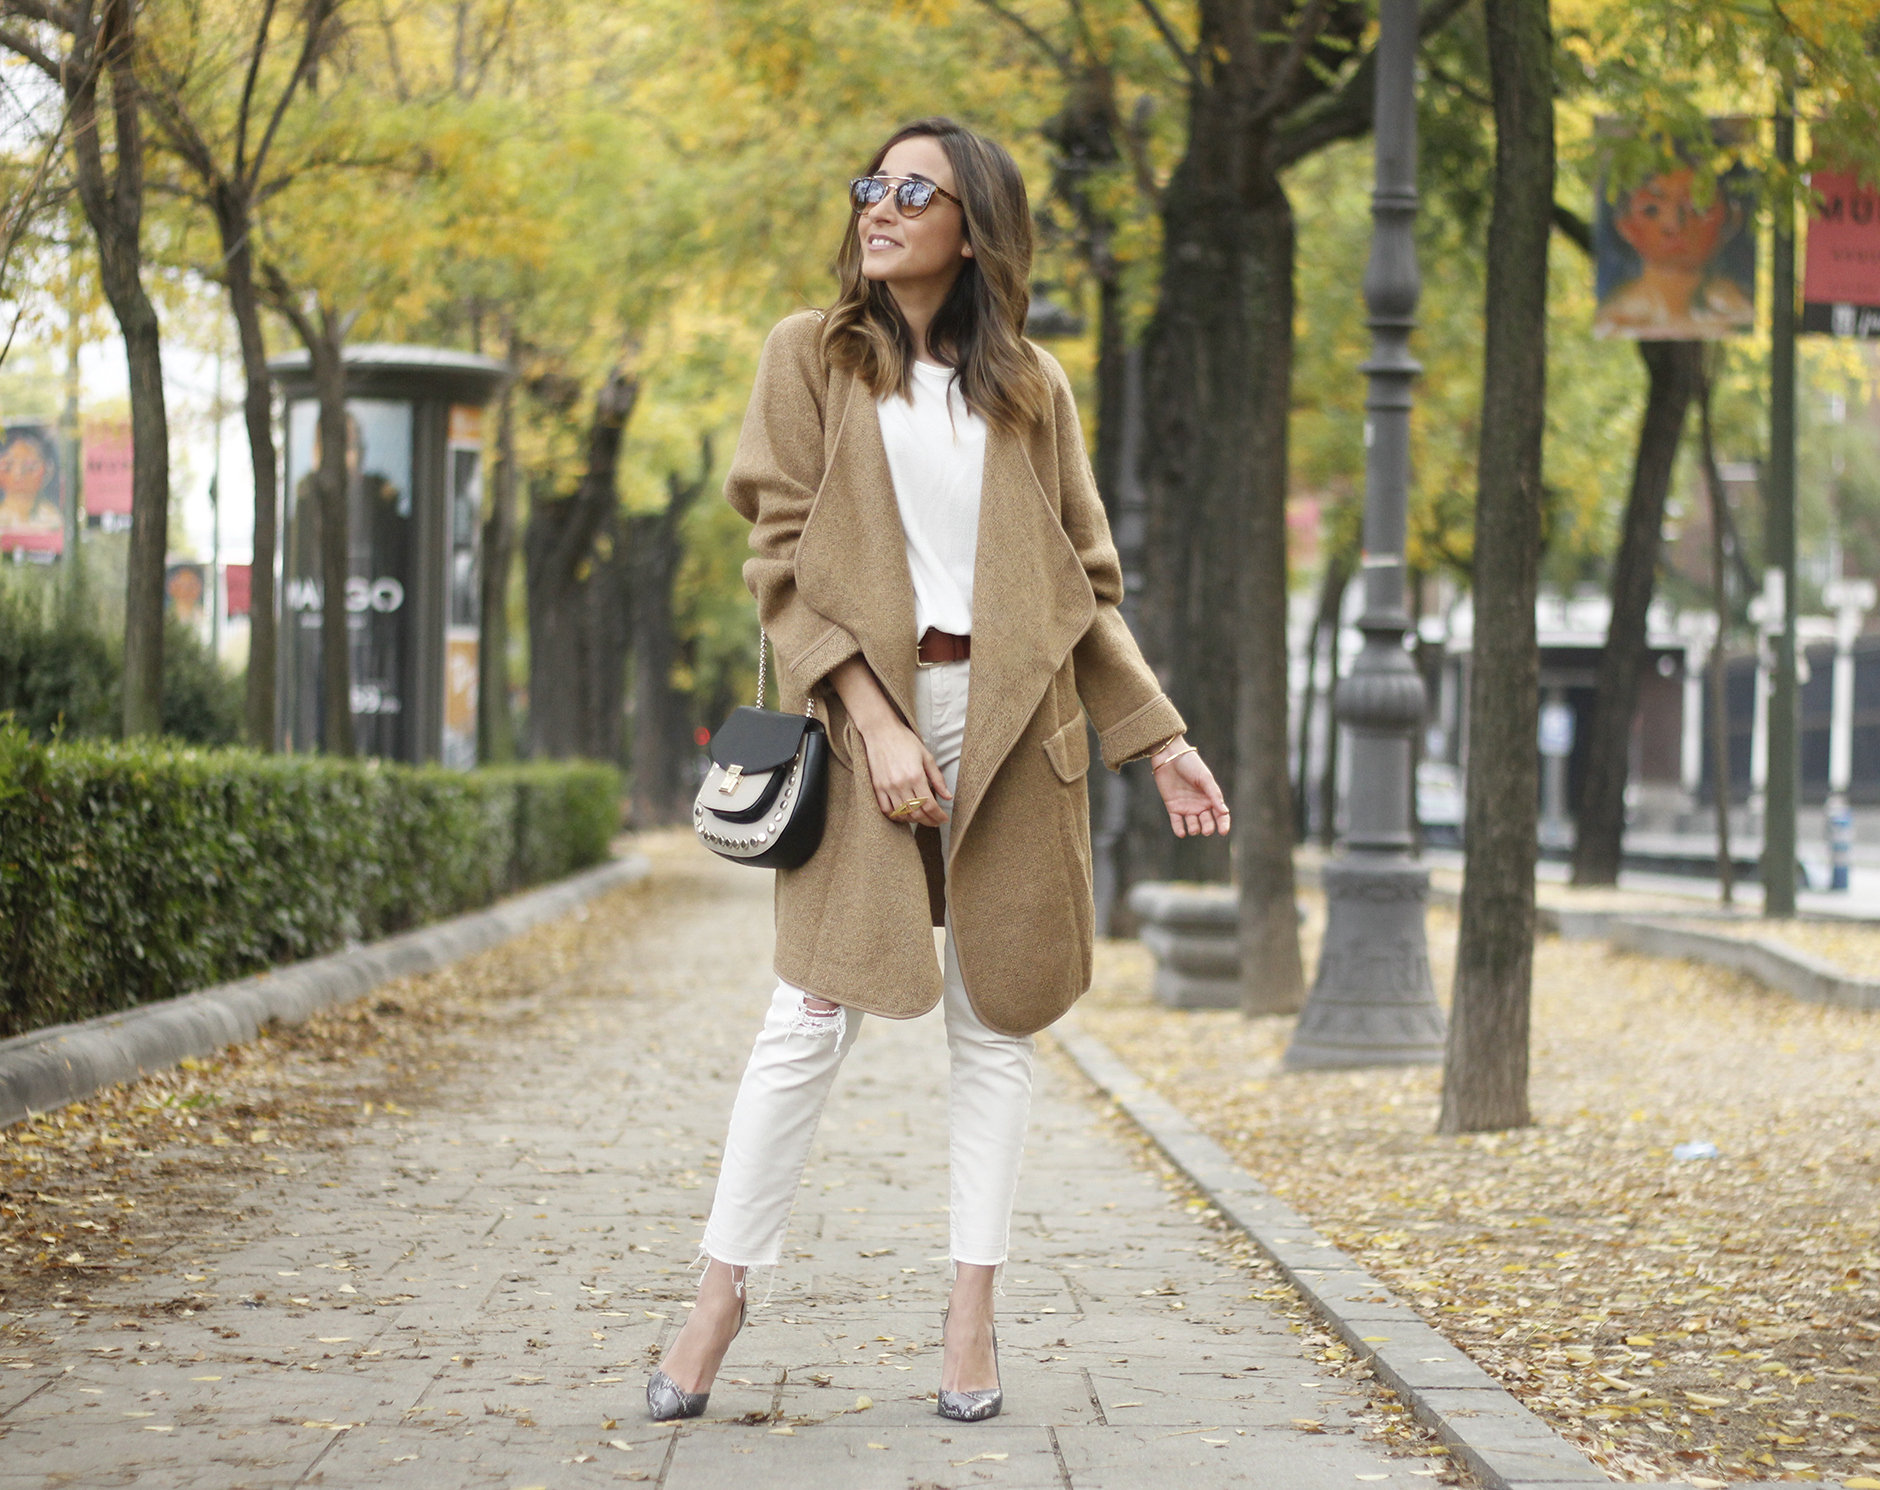 Camel Coat sheinside white outfit heels uterqüe purse outfit06